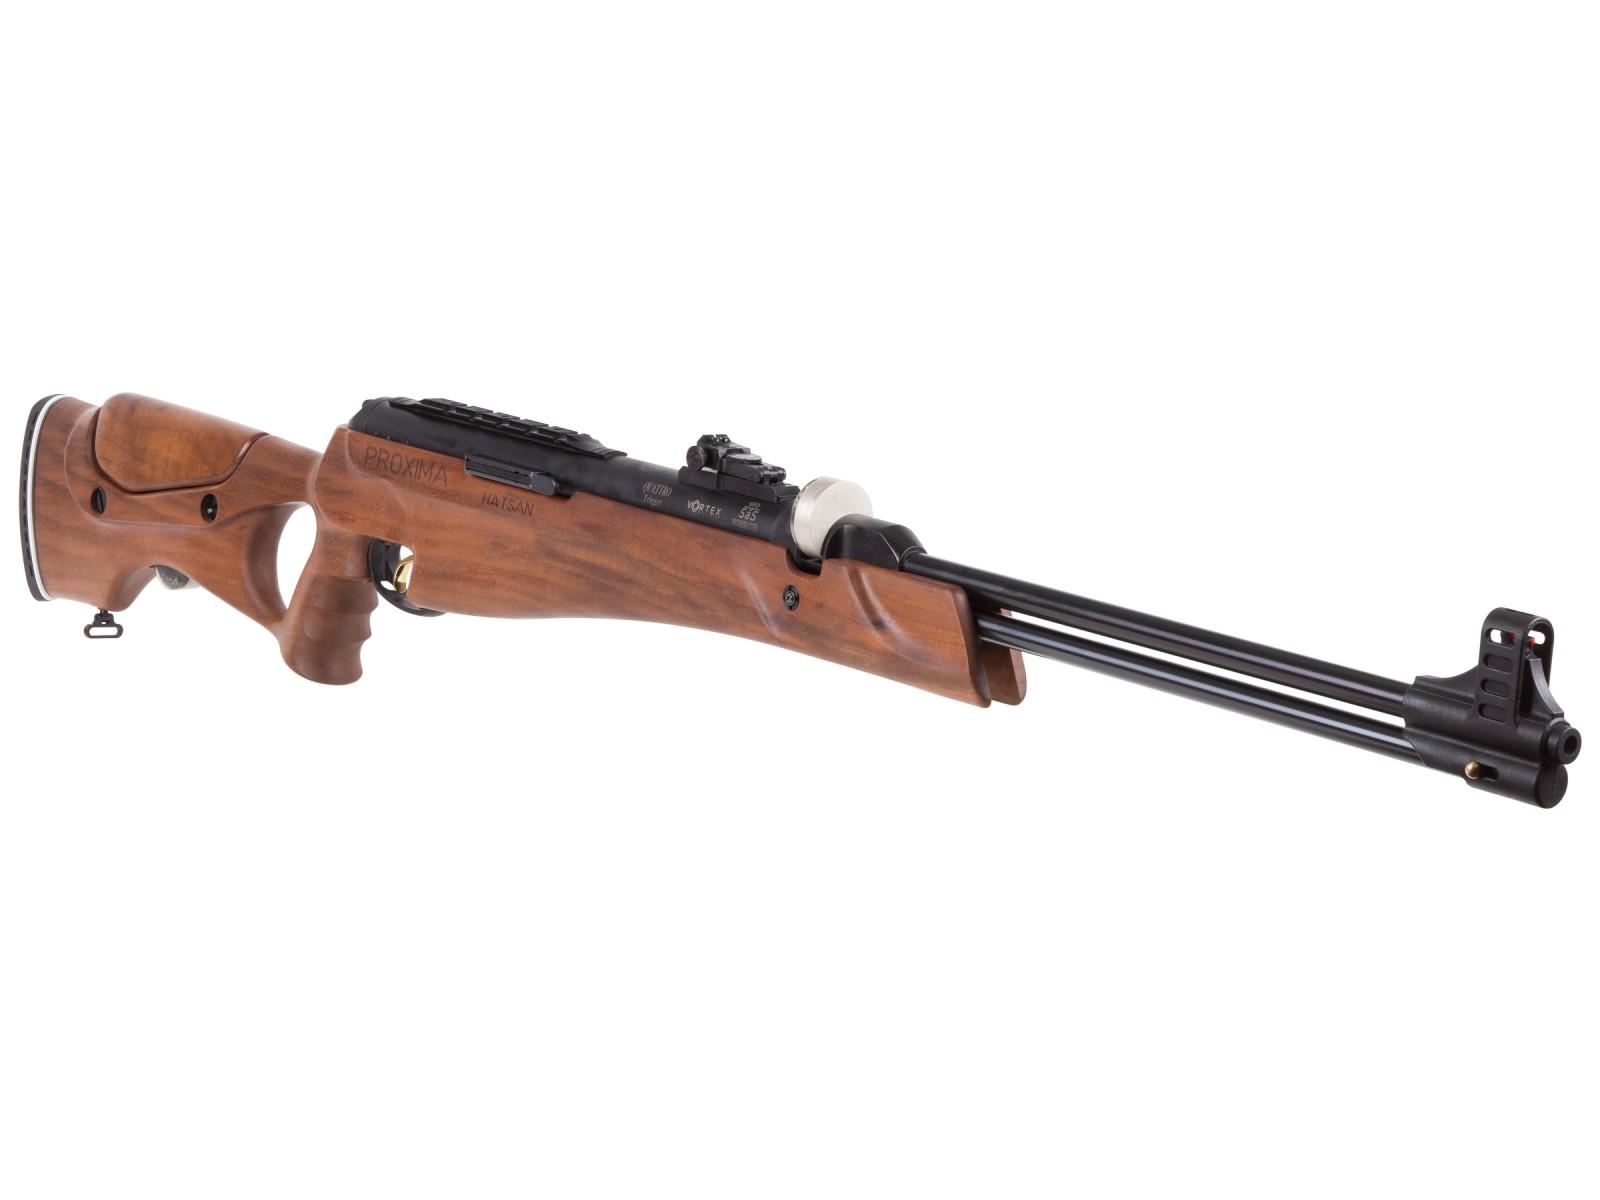 Cheap Proxima Multishot Underlever Air Rifle 0.22